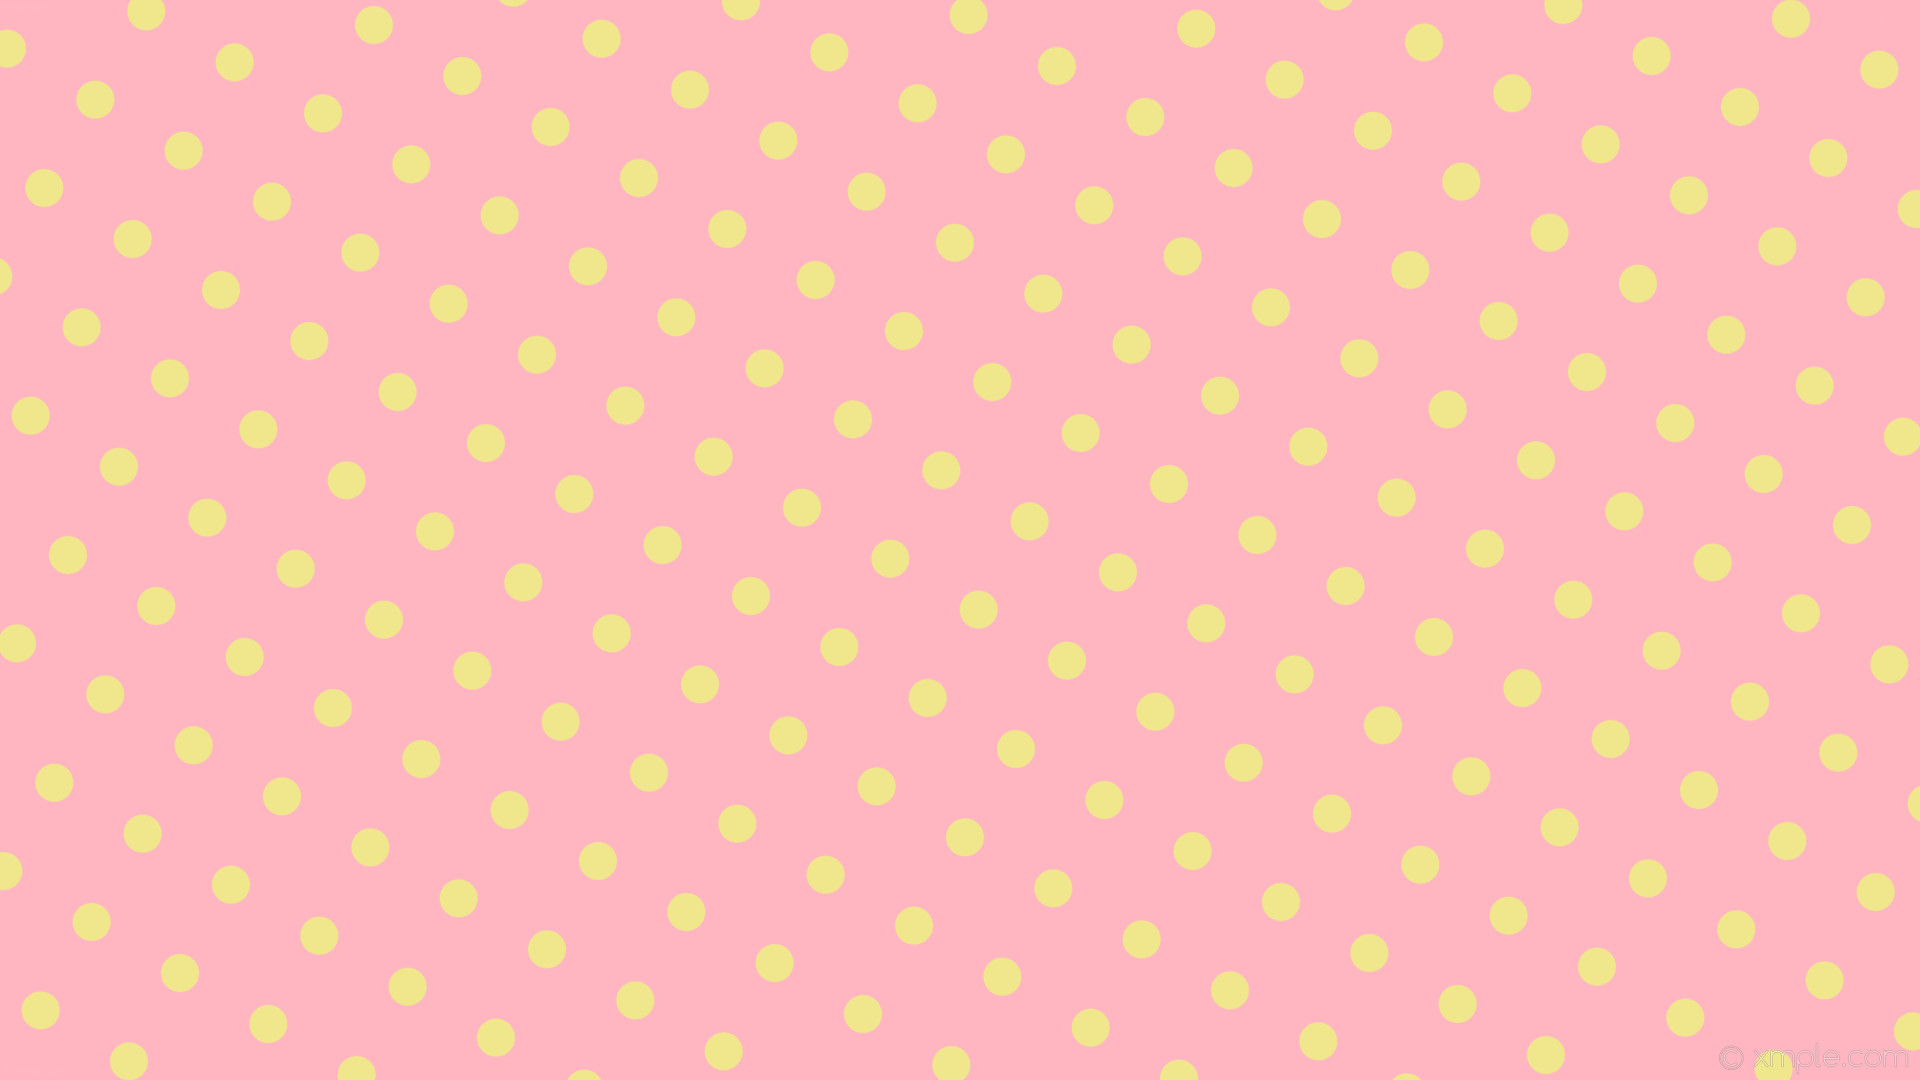 wallpaper pink polka yellow spots dots light pink khaki #ffb6c1 #f0e68c  150° 38px